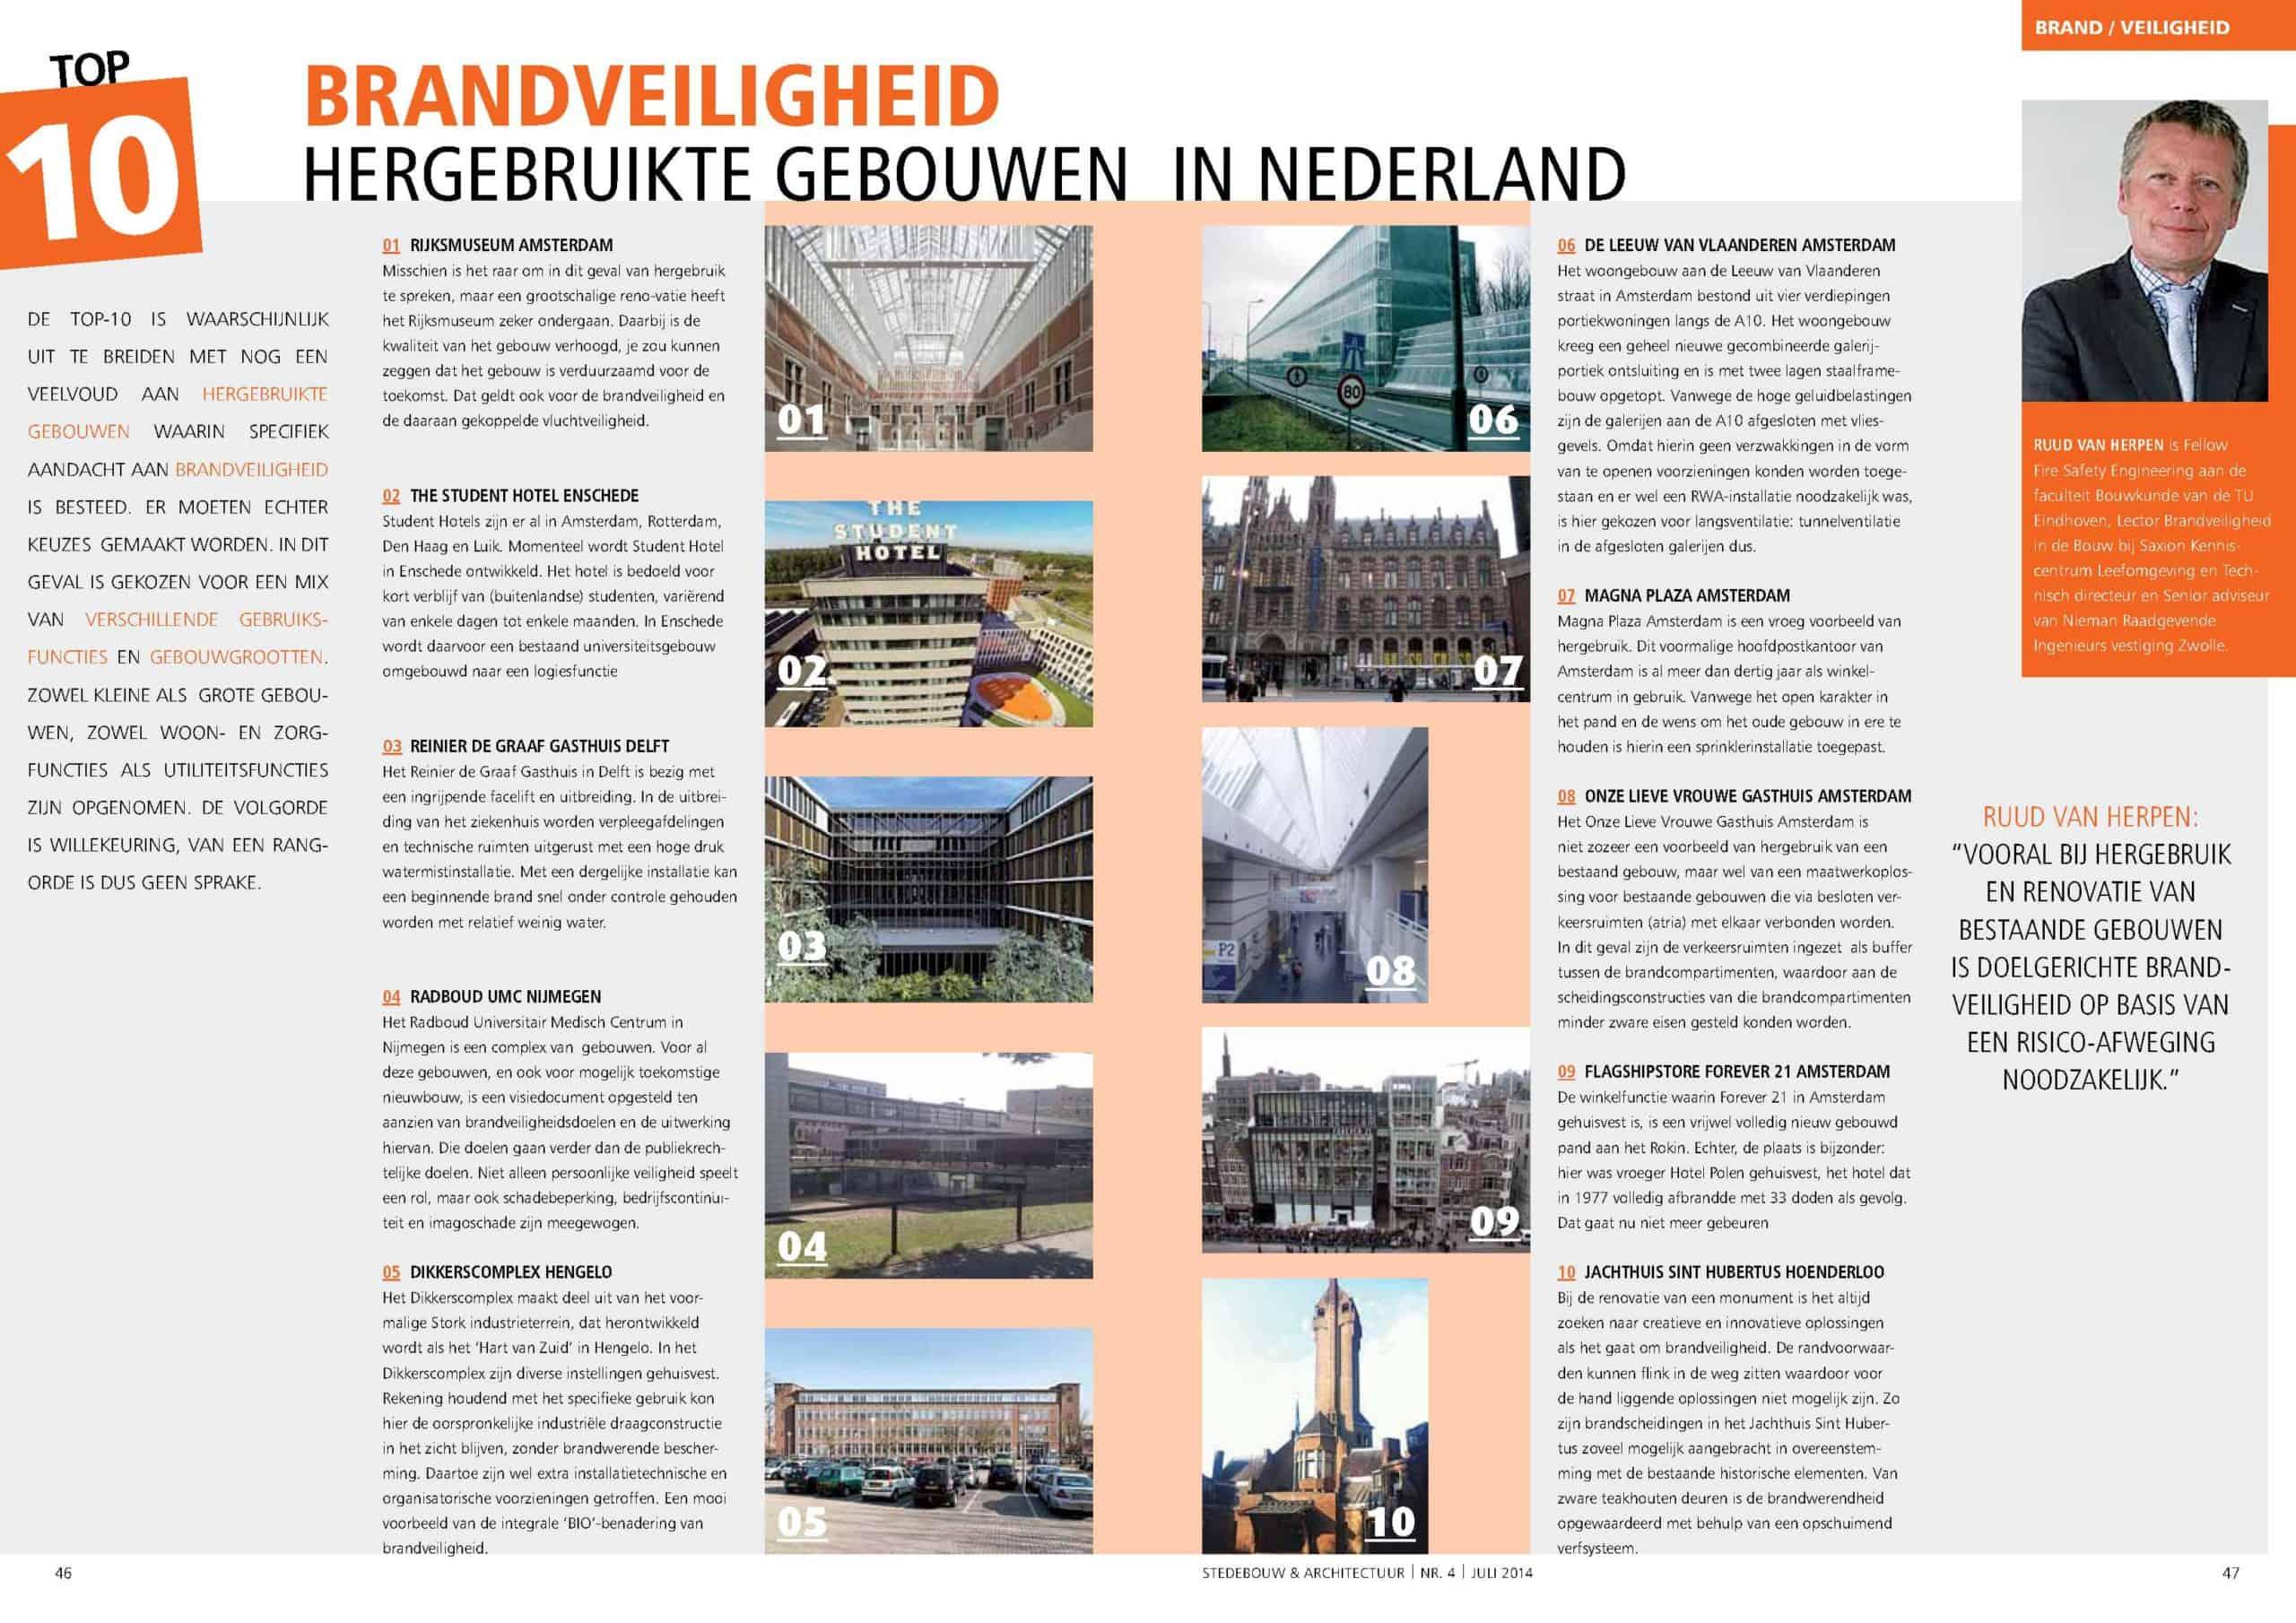 Top 10 Brandveiligheid hergebruikte gebouwen in Nederland